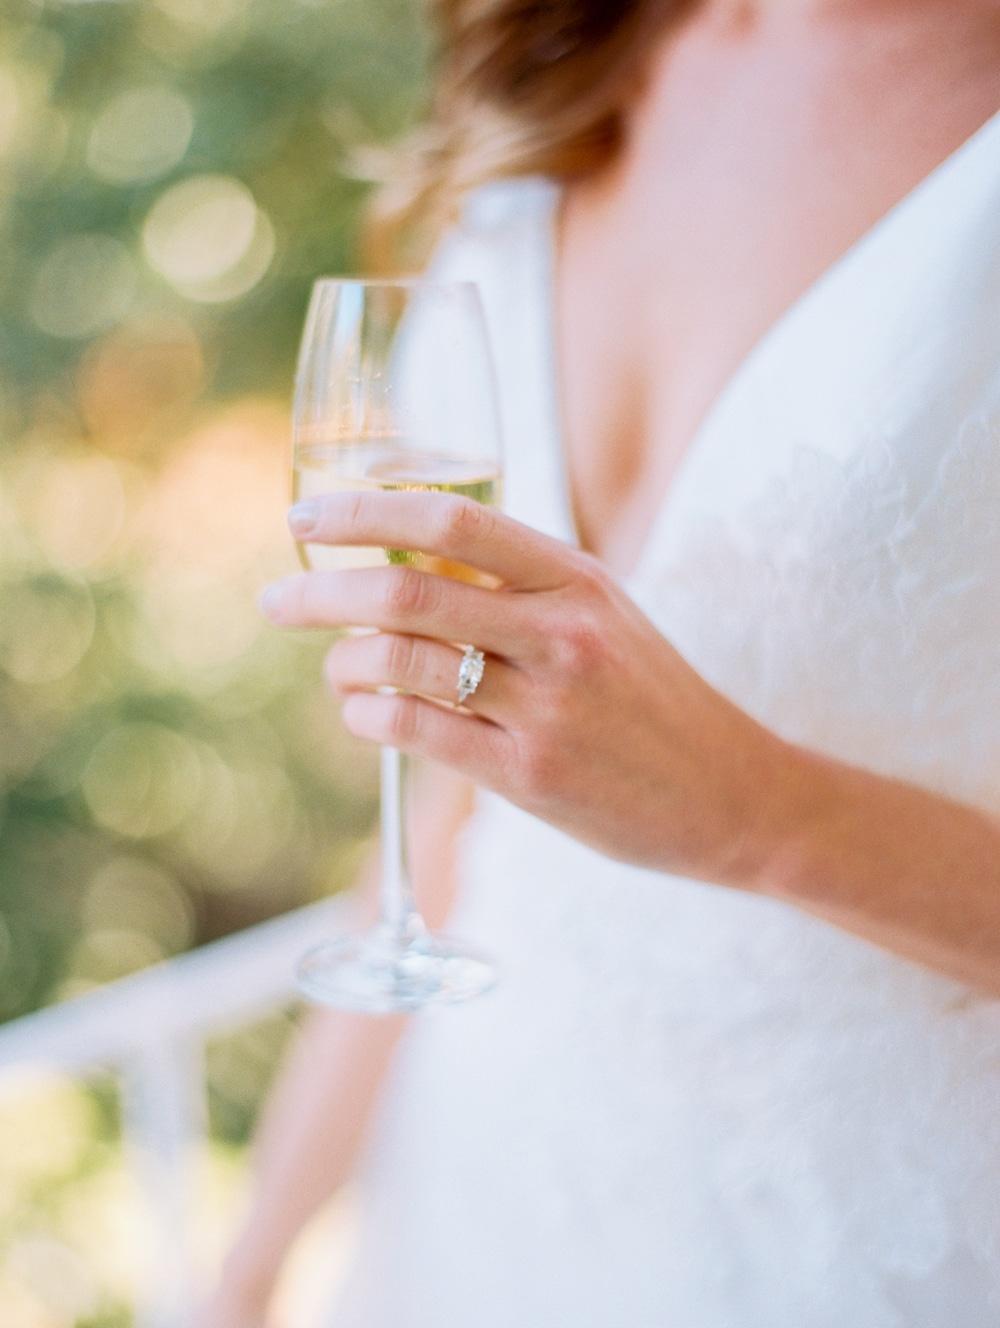 kristin-la-voie-photography-Austin-wedding-photographer-matties-green-pastures-40